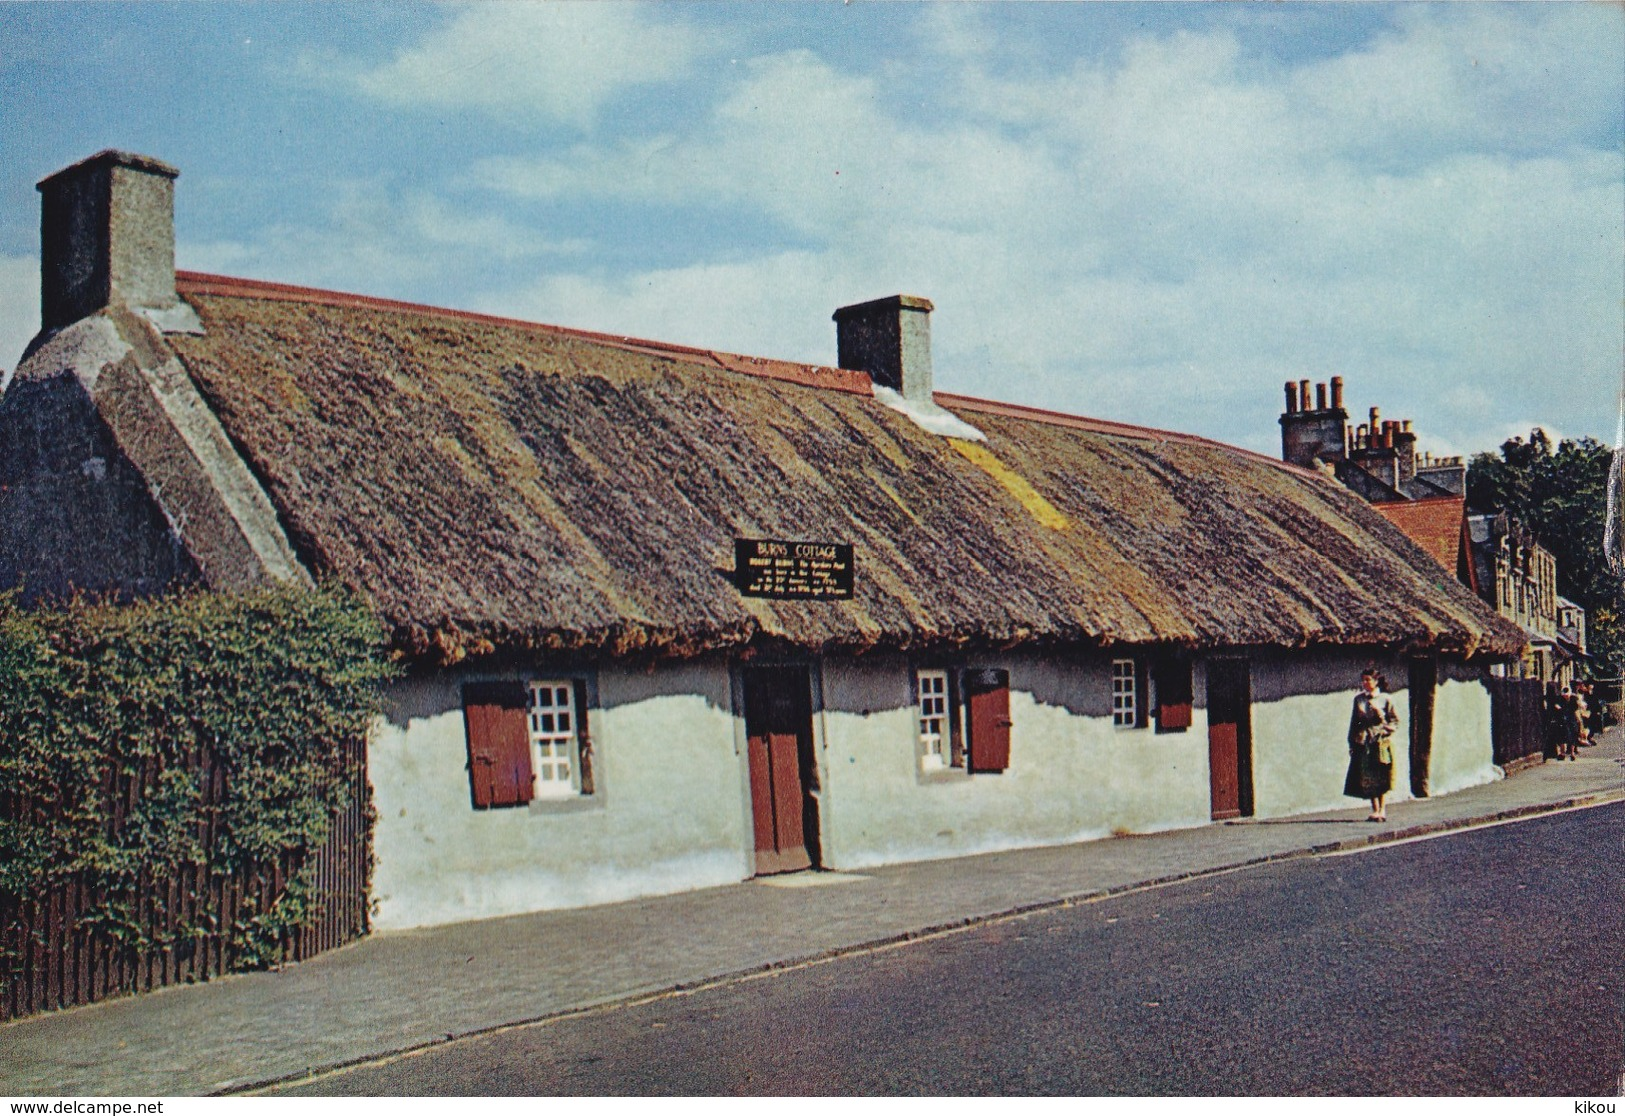 ALLOWAY - Lieu De Naissance Du Poète Ecossais Robert Burns Et Musée Scotland's National Bard (Burn's Cottage) - - Ayrshire